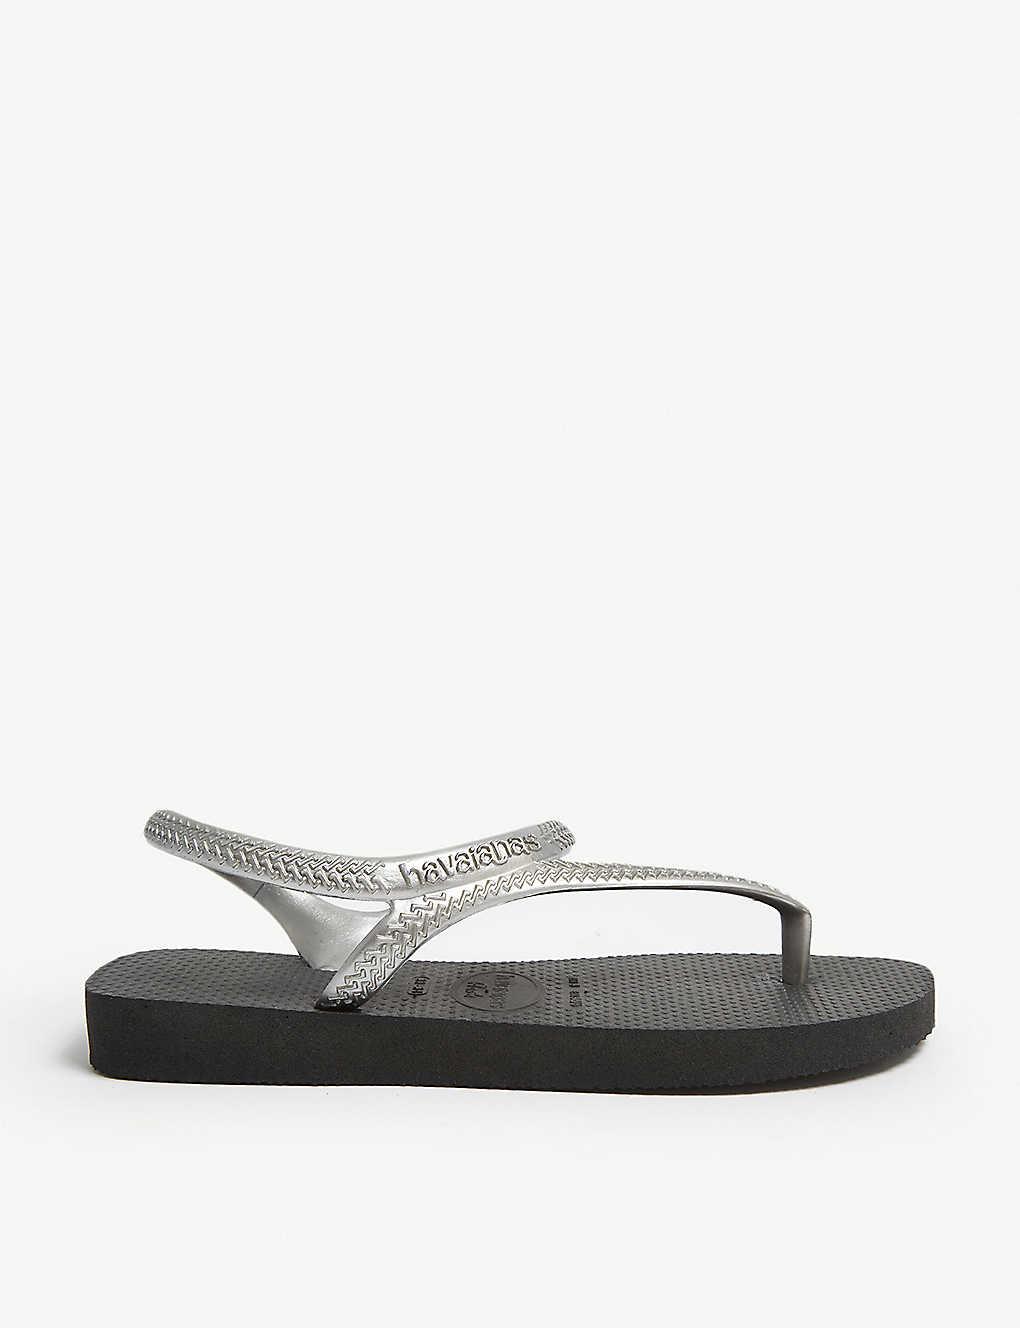 6c2bb4866f3e HAVAIANAS - Flash Urban rubber sandals